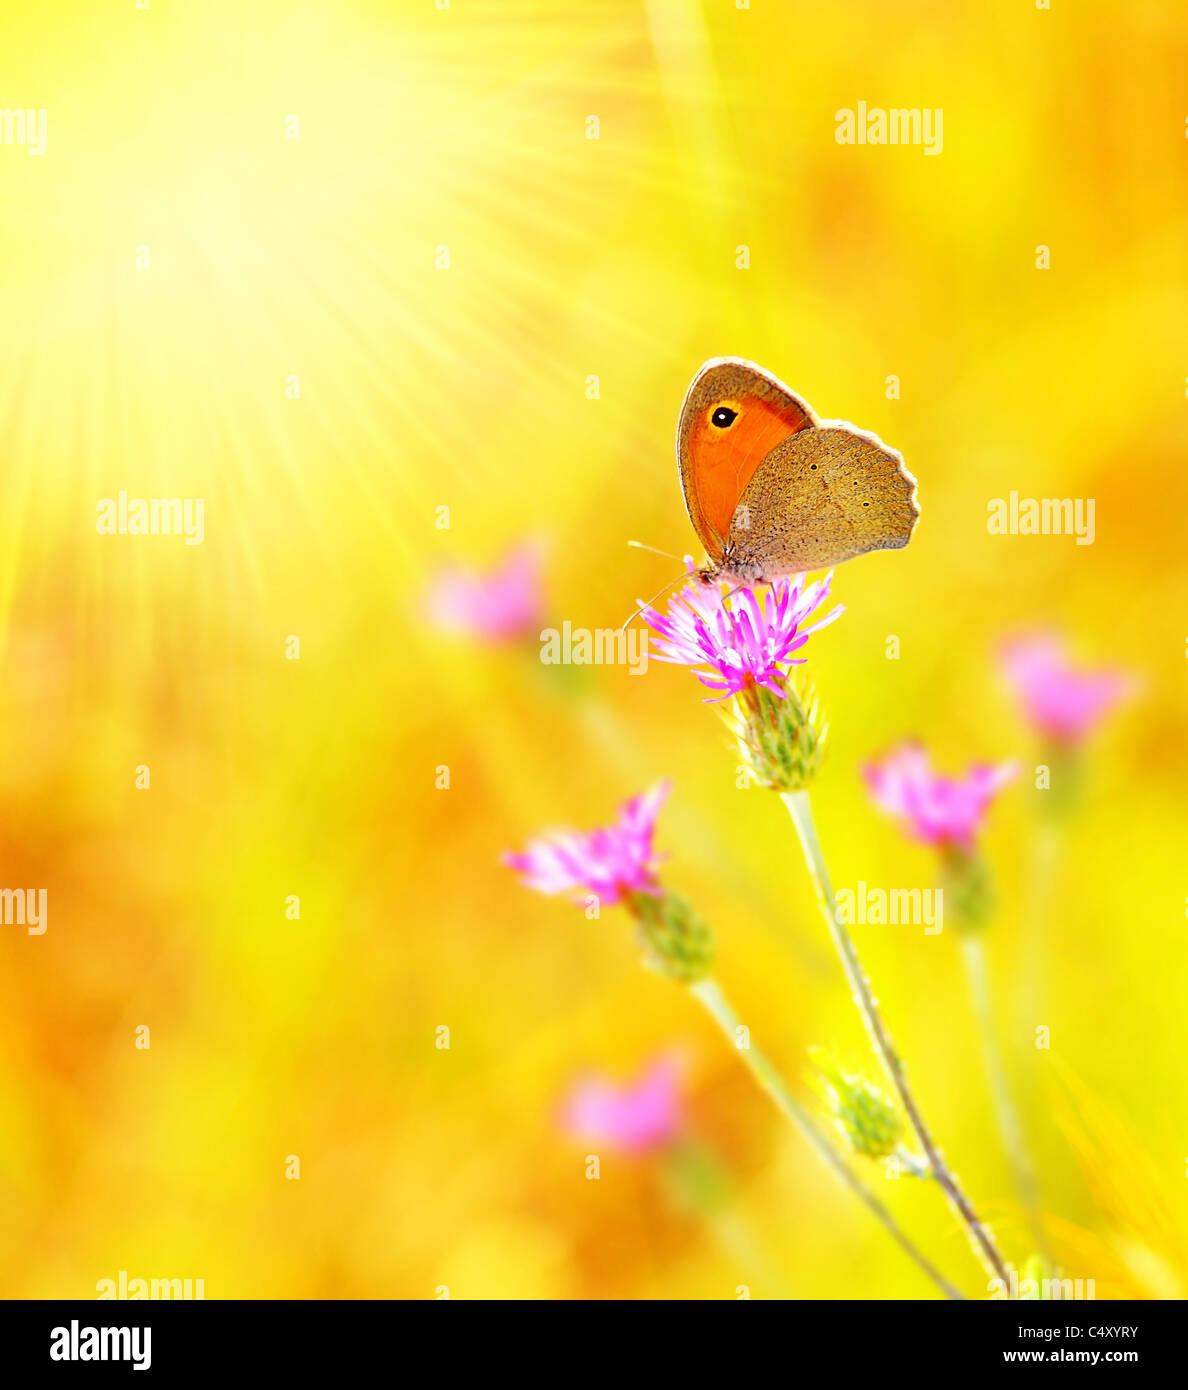 Hermosa mariposa amarilla extreme closeup macro, naturaleza vida en primavera Imagen De Stock